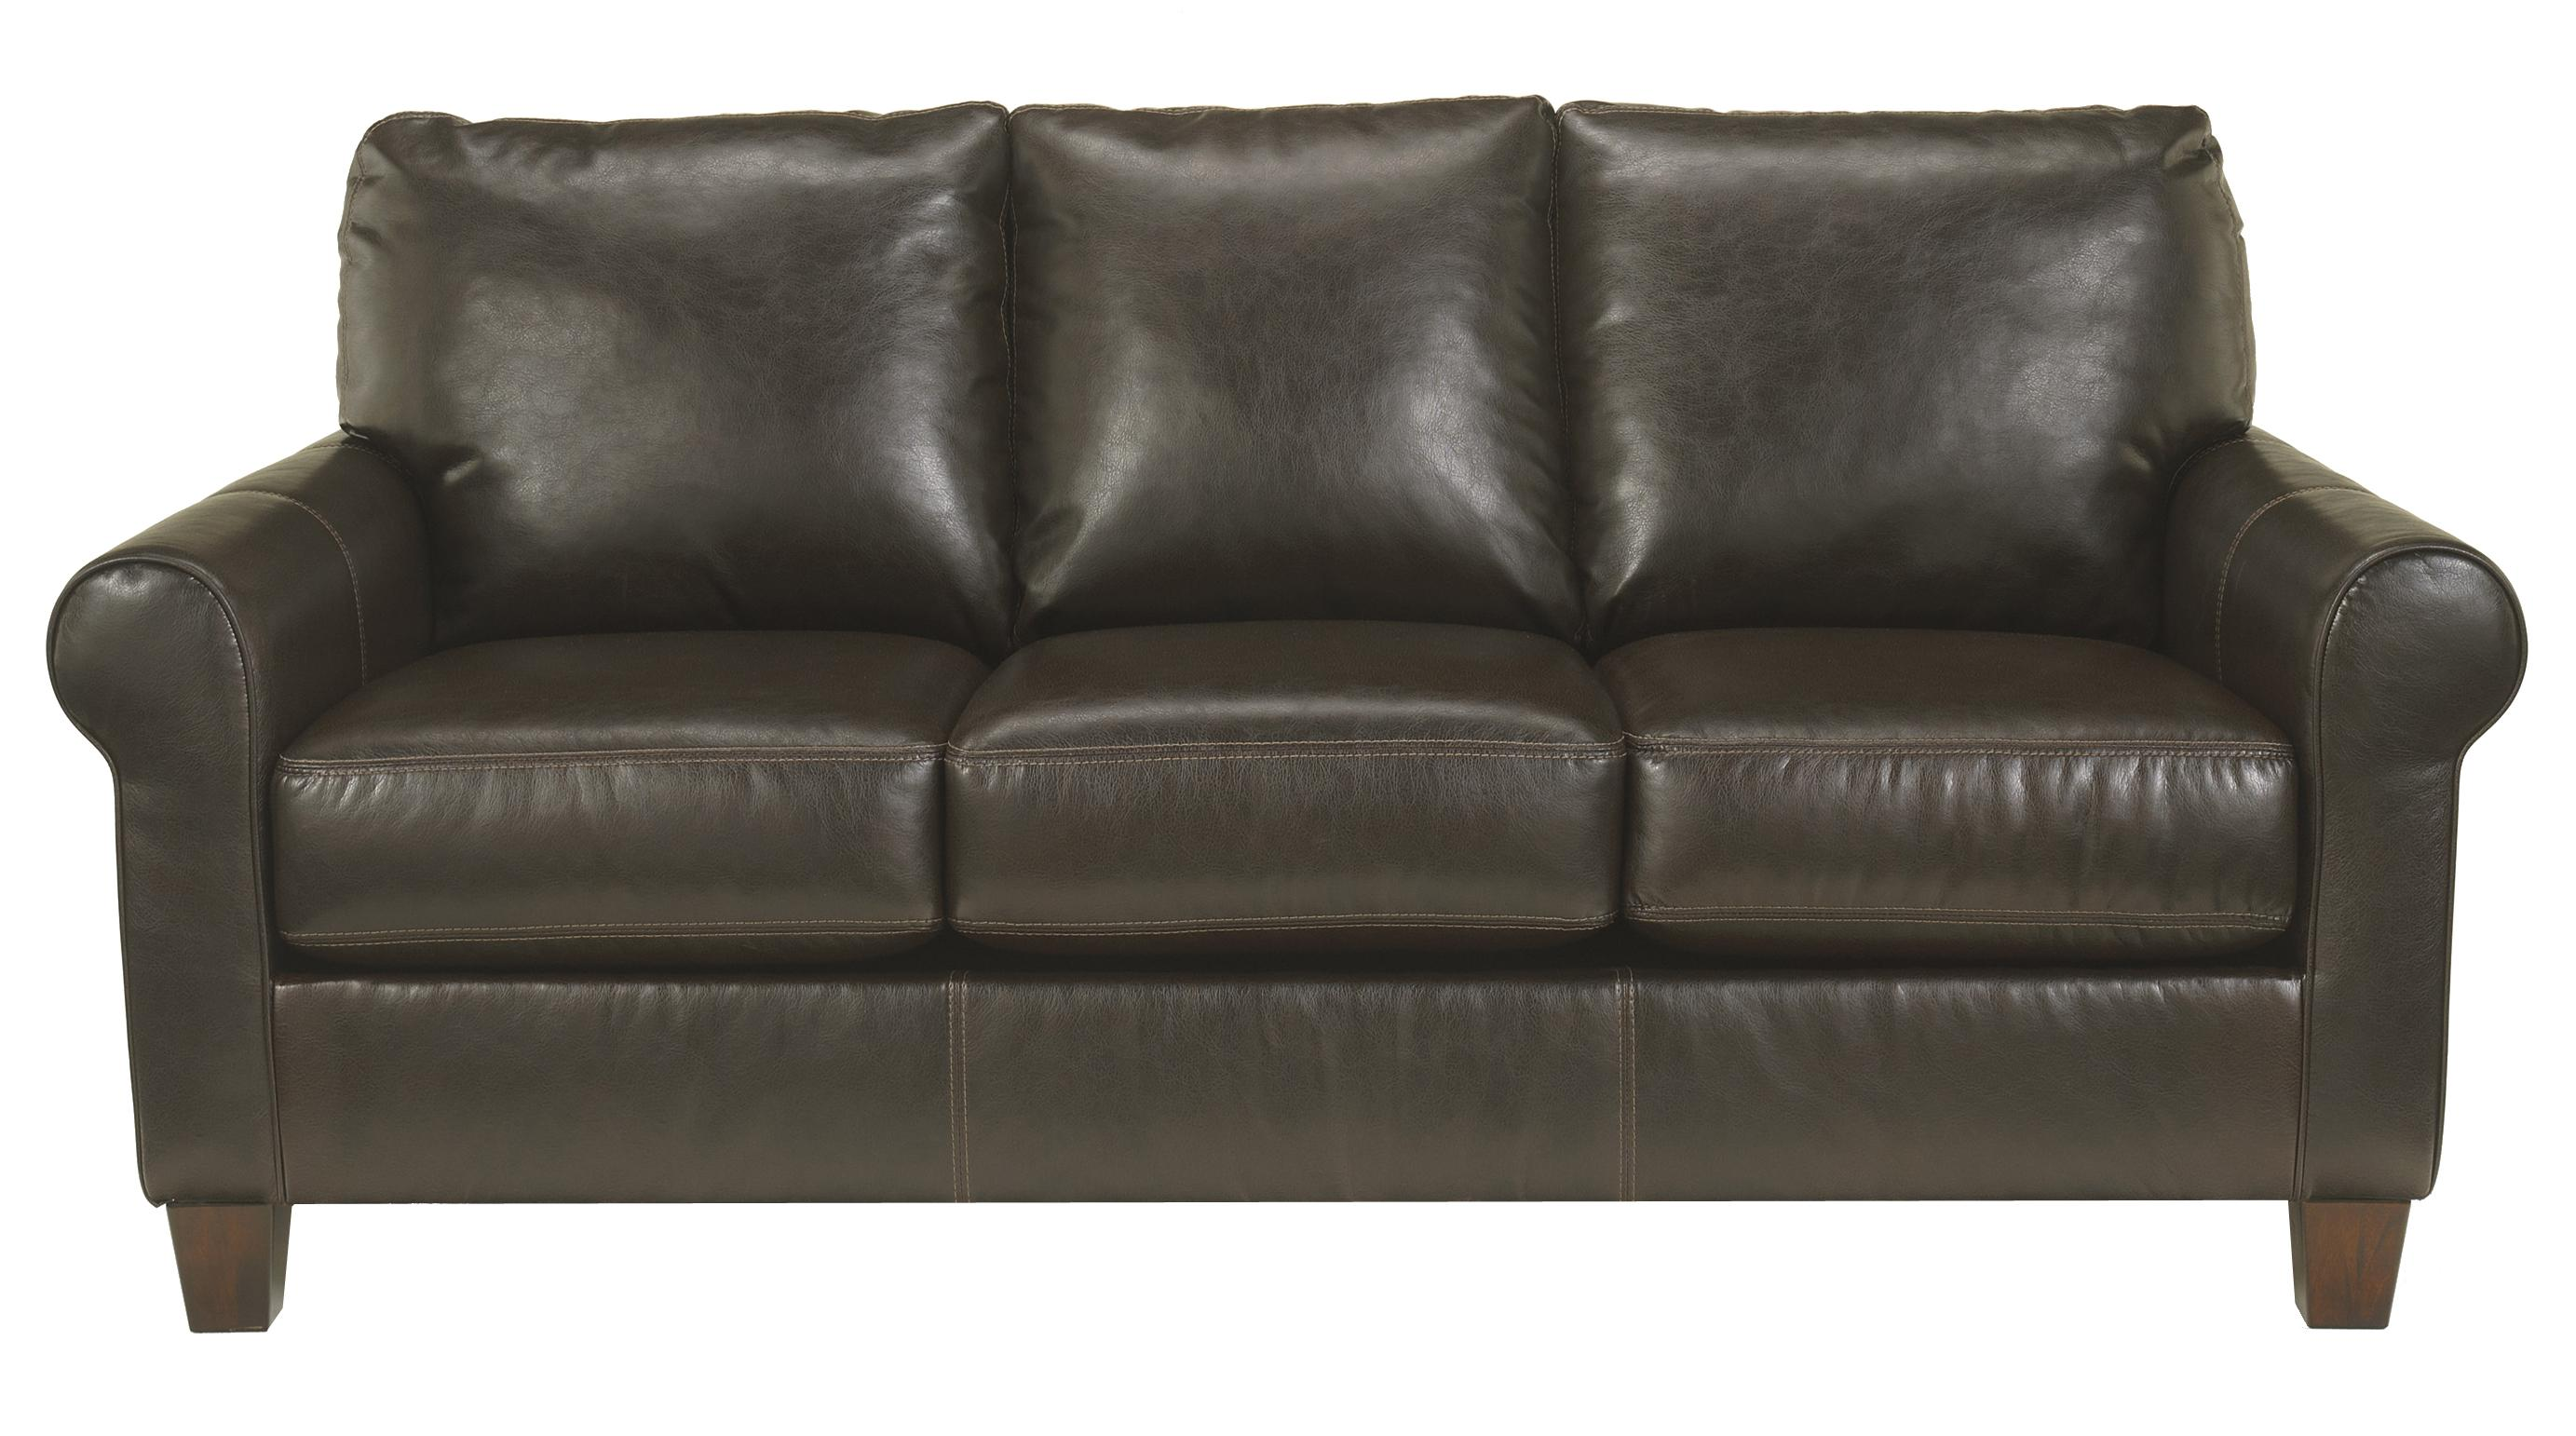 Benchcraft Nastas DuraBlend - Bark Full Sofa Sleeper - Item Number: 2330036